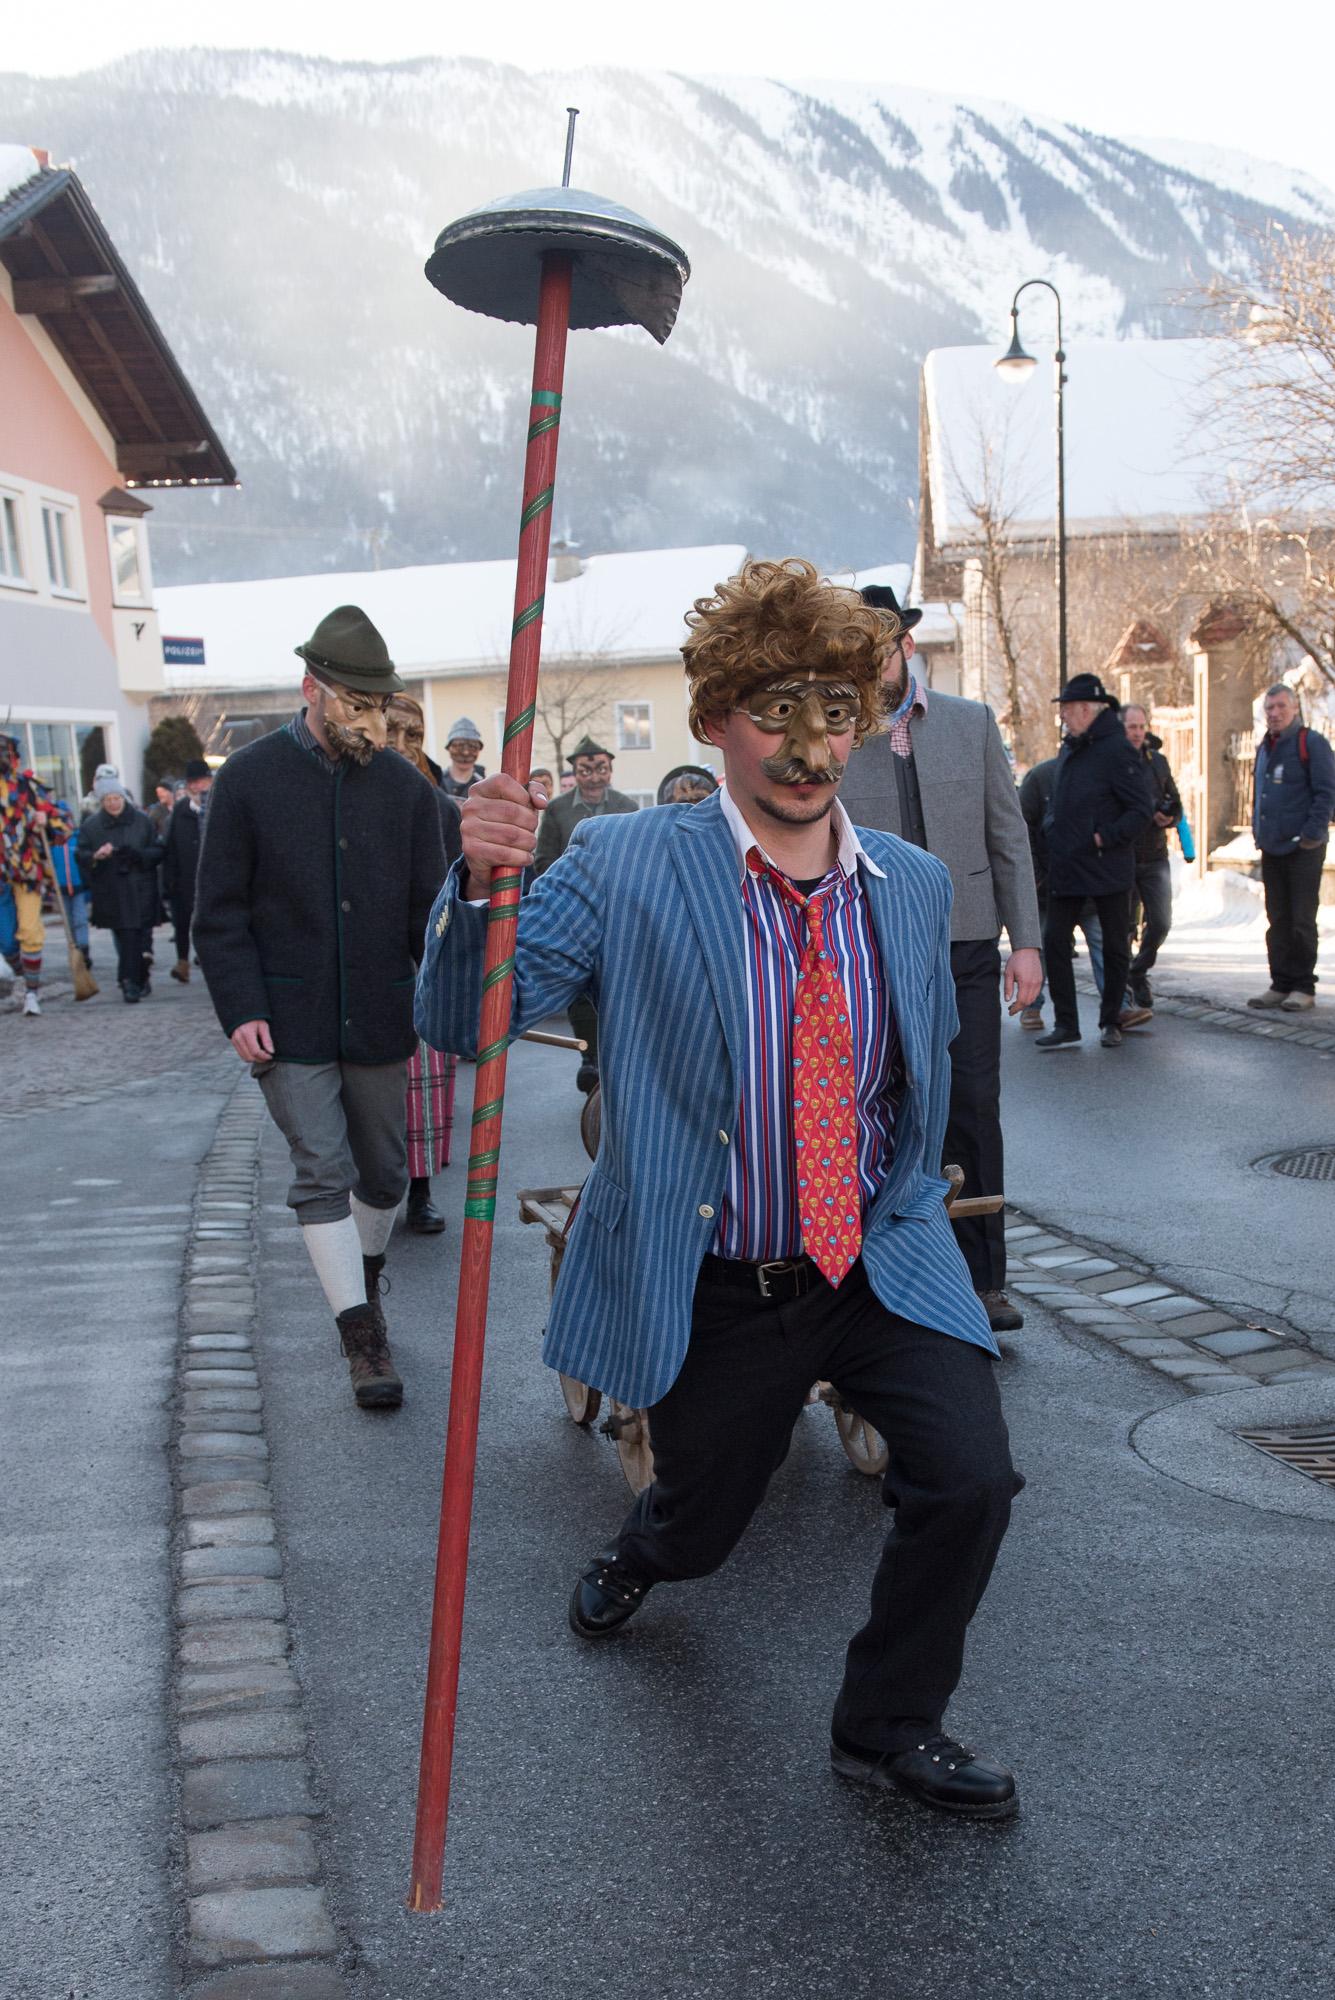 2019_Feb_Austria_Nassareith_Carnaval_2399.jpg